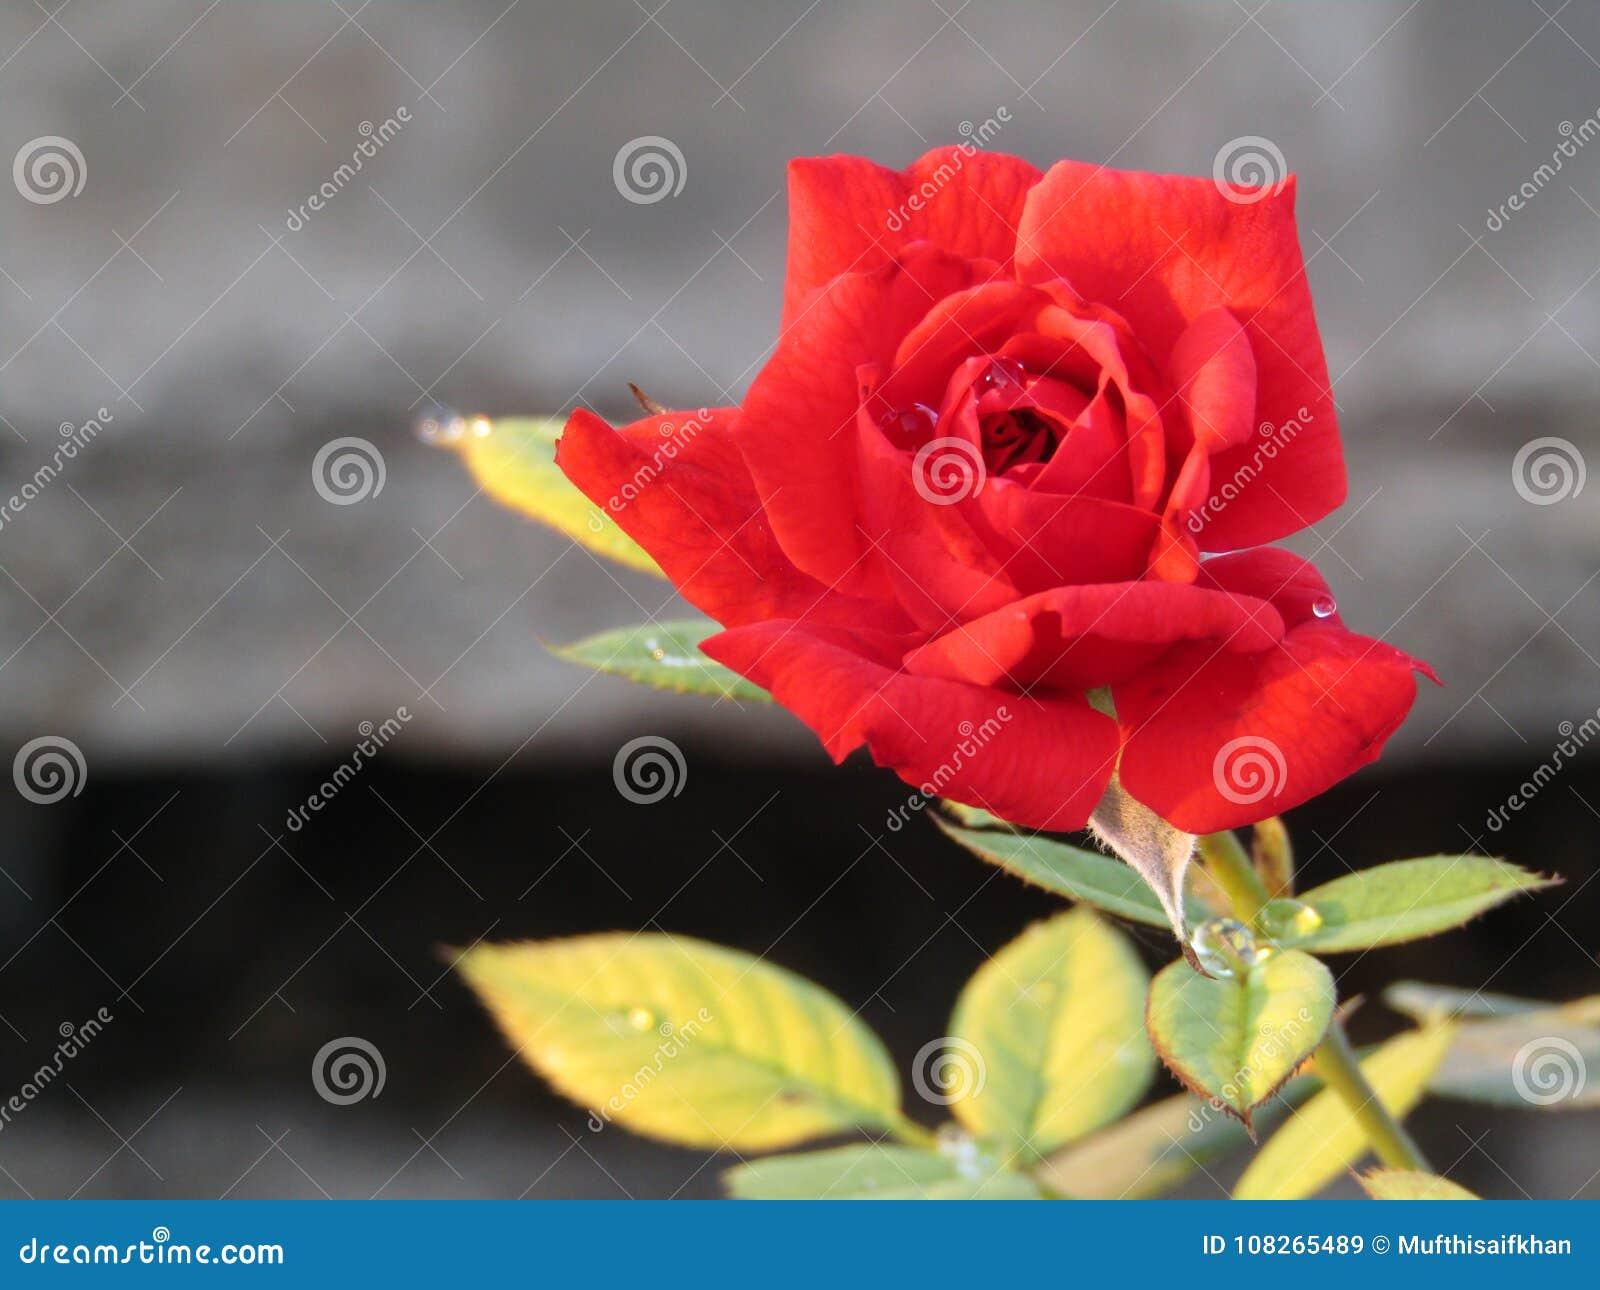 Beautiful red rose flowers beauty stock image image of wallpapers beautiful red rose flowers beauty izmirmasajfo